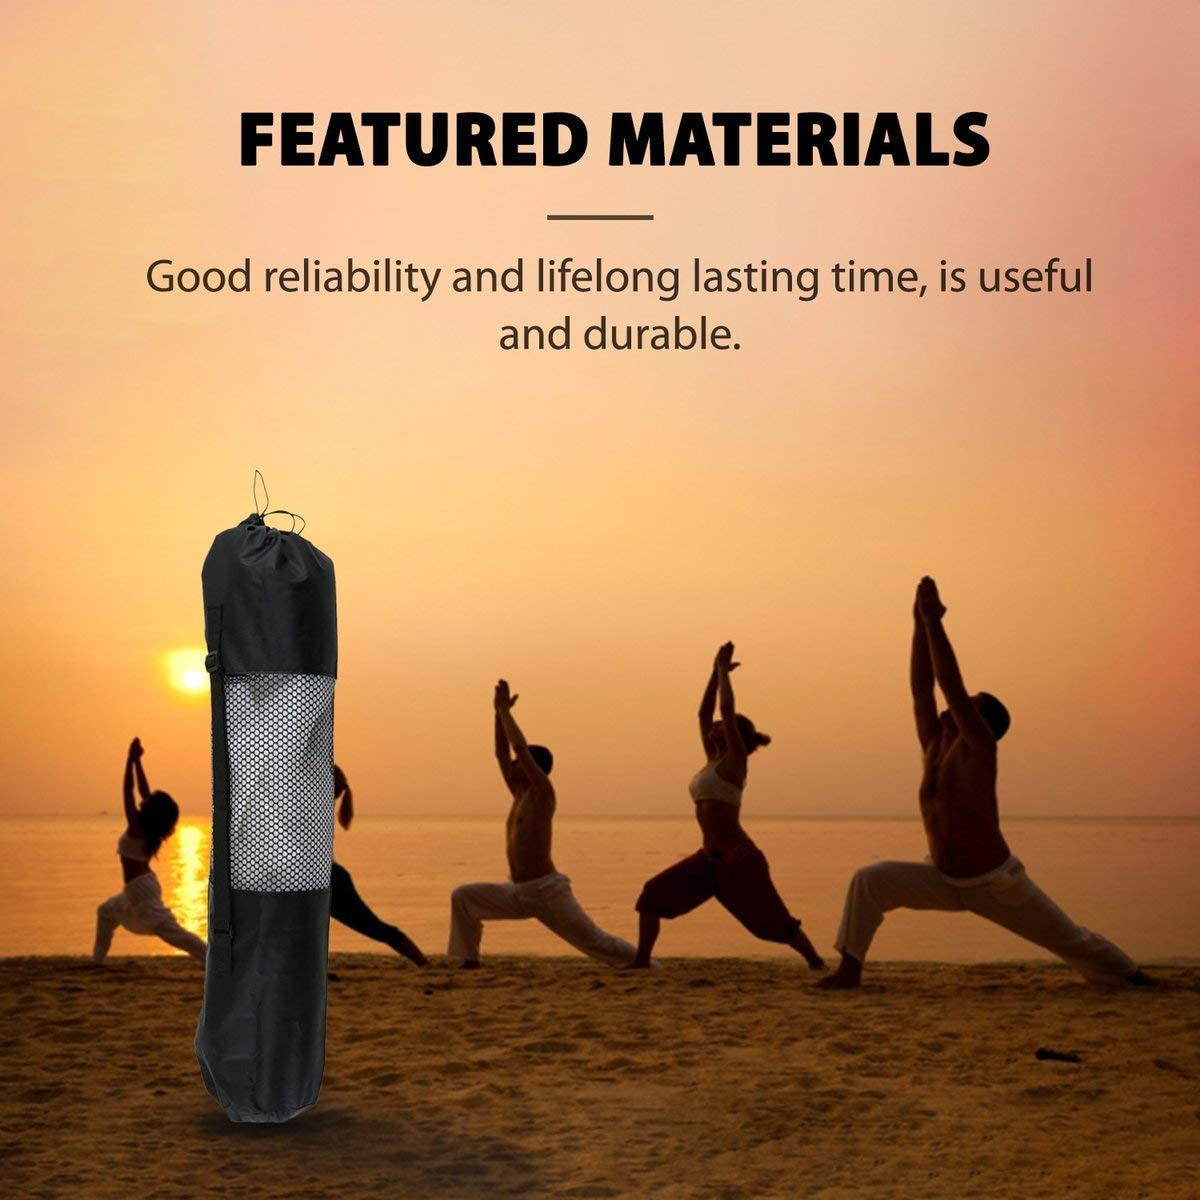 Greatangle Tragbare Yoga Pilates Matte Nylontasche Carrier Mesh Center Verstellbarer Gurt Tragetasche Rolling Type Vaccum Compressed Bags Schwarz